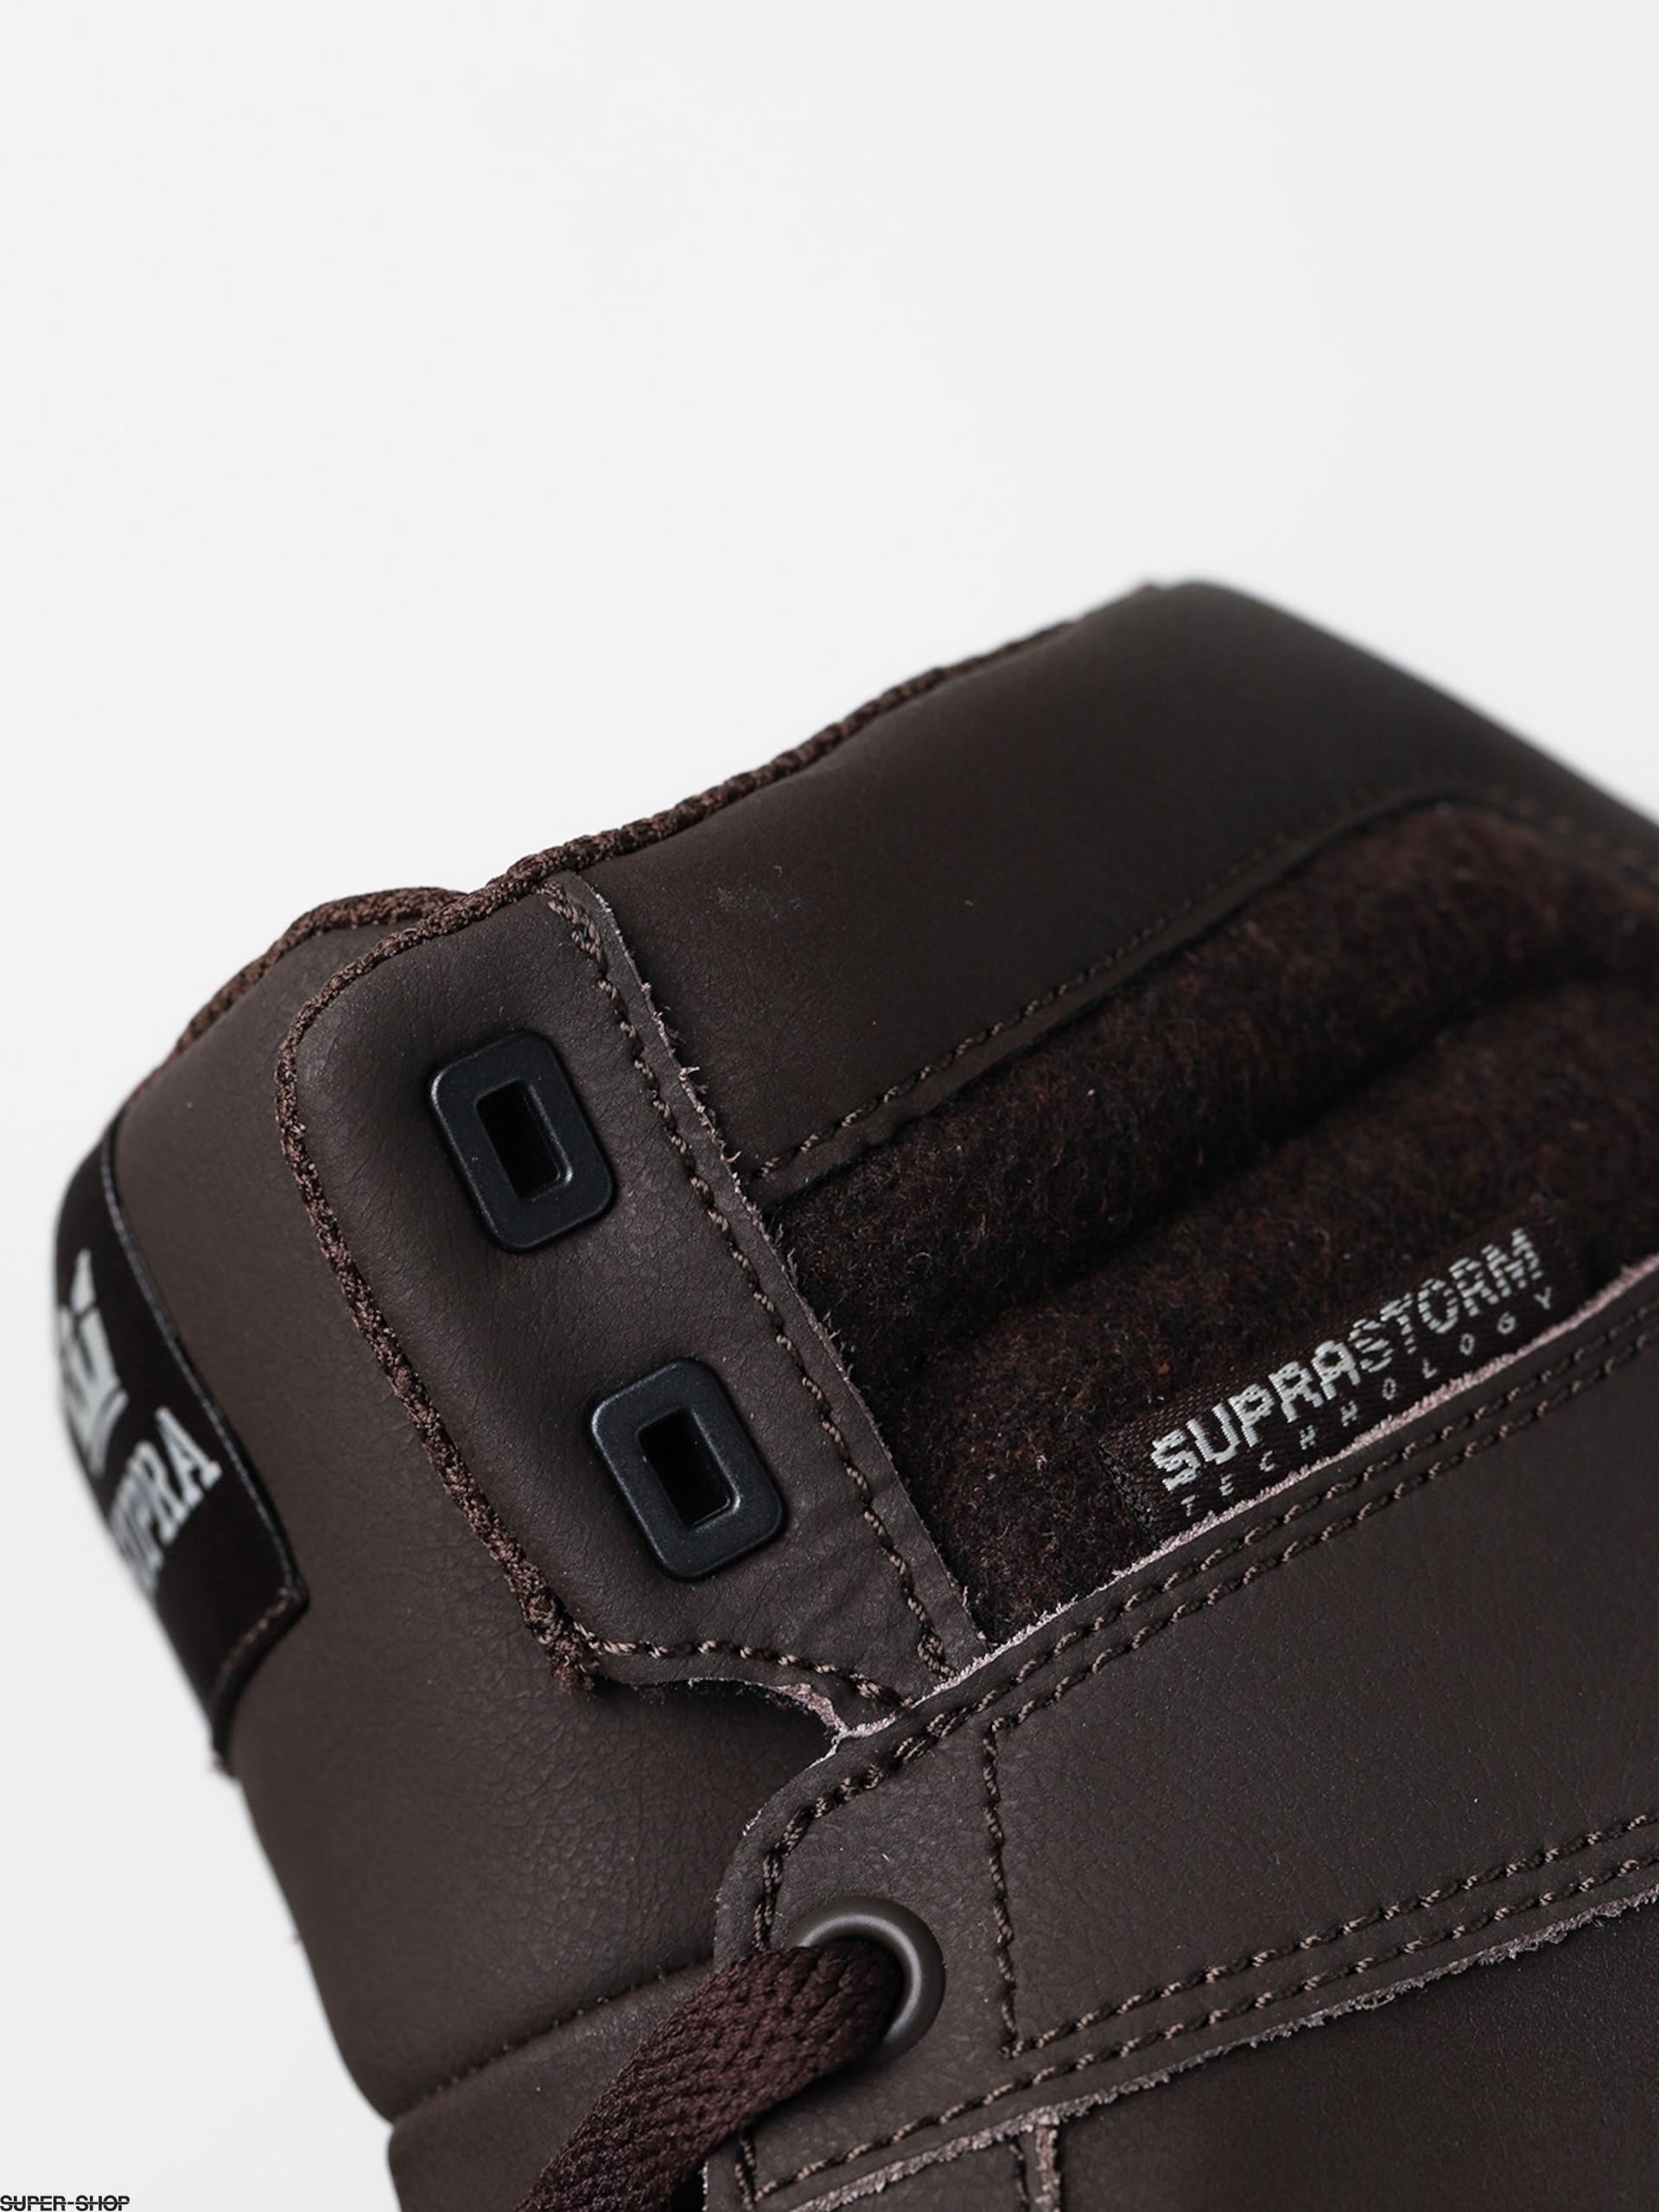 Chaussures SUPRA ALUMINUM demitasse black white